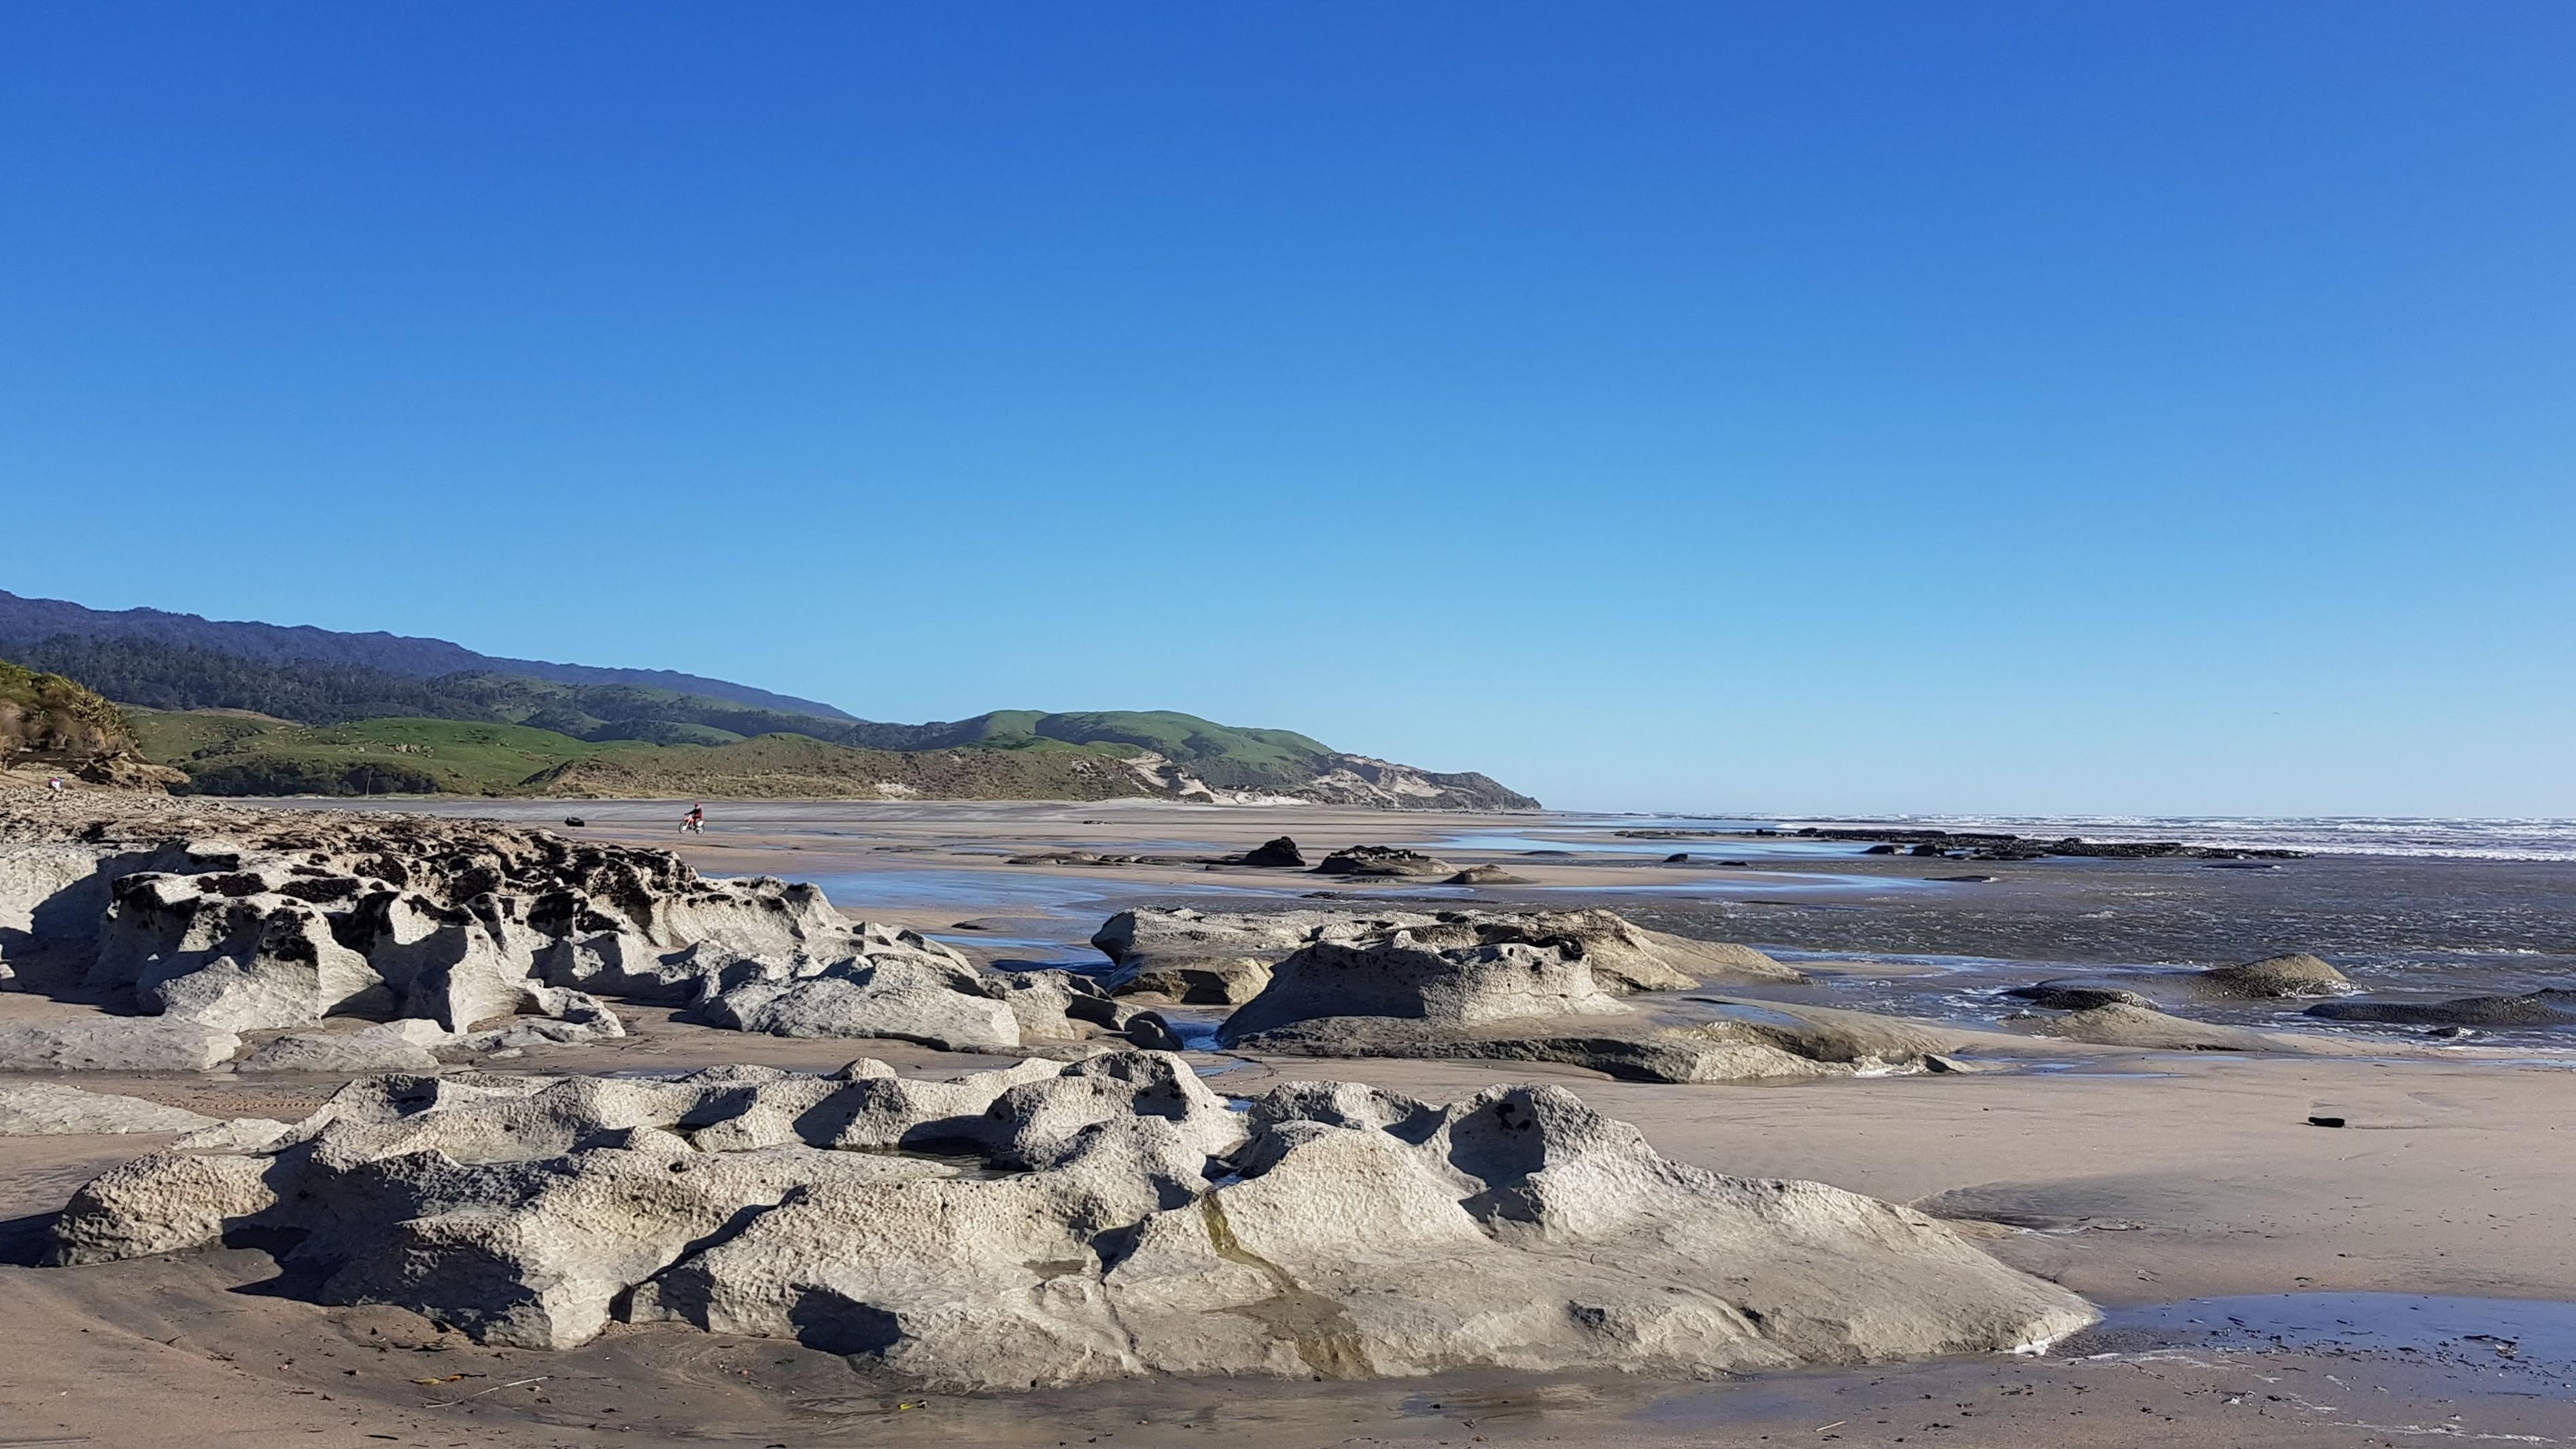 Sea- sculpted rock platform towards the Anaweka River mouth